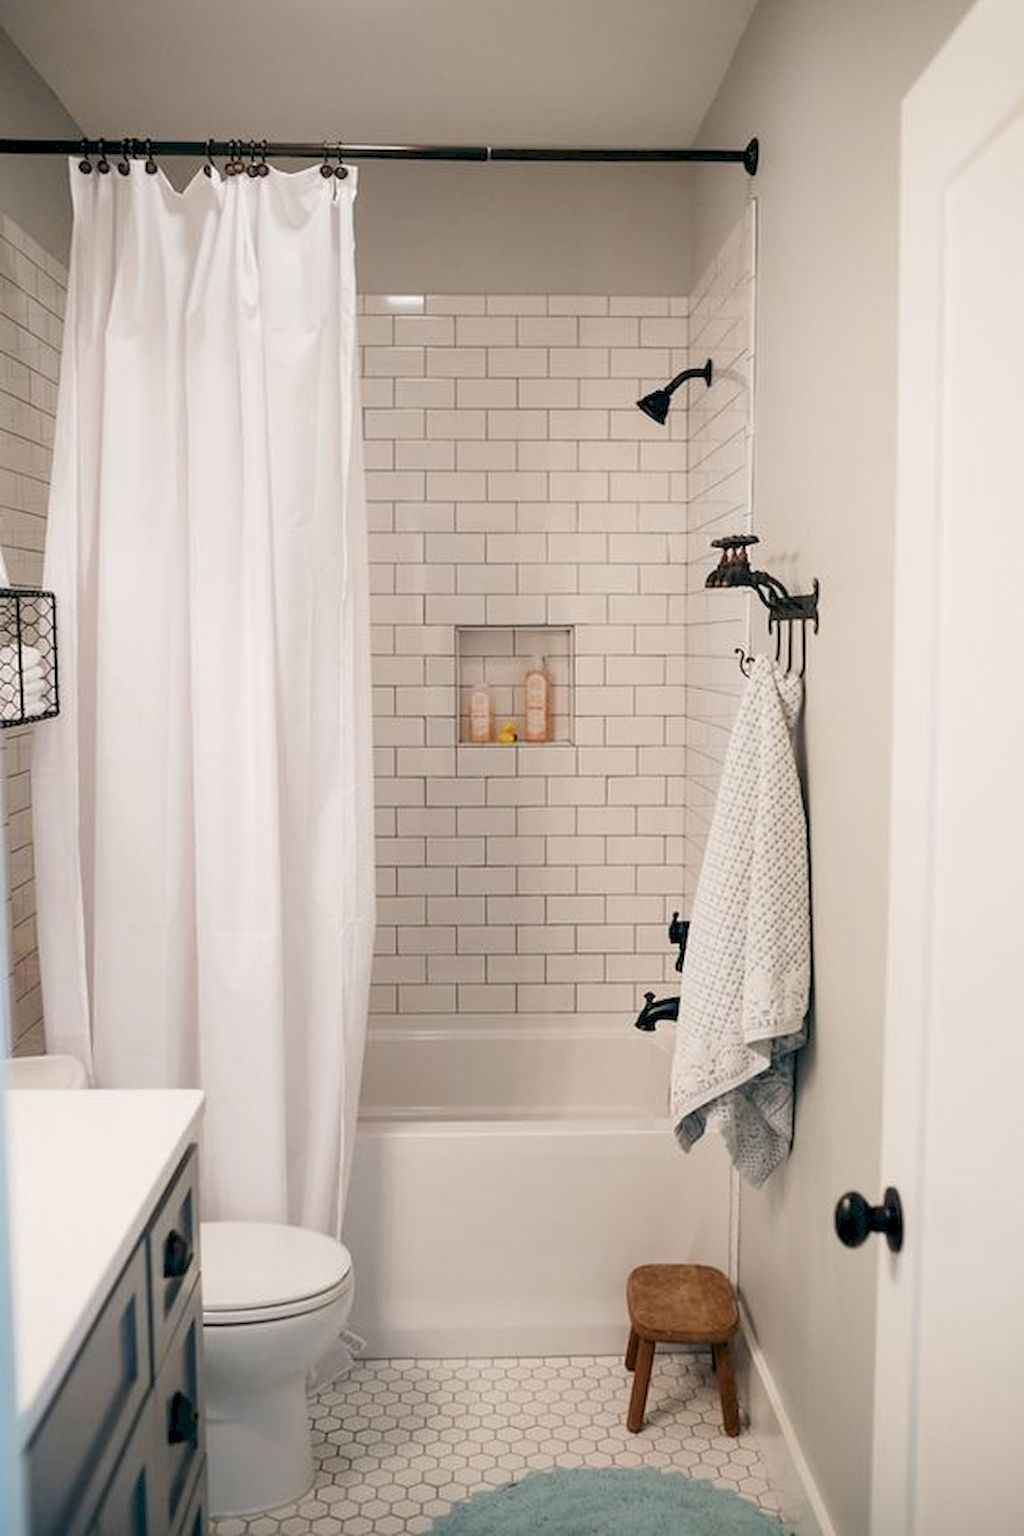 Inspiring apartment bathroom remodel ideas on a budget (19)